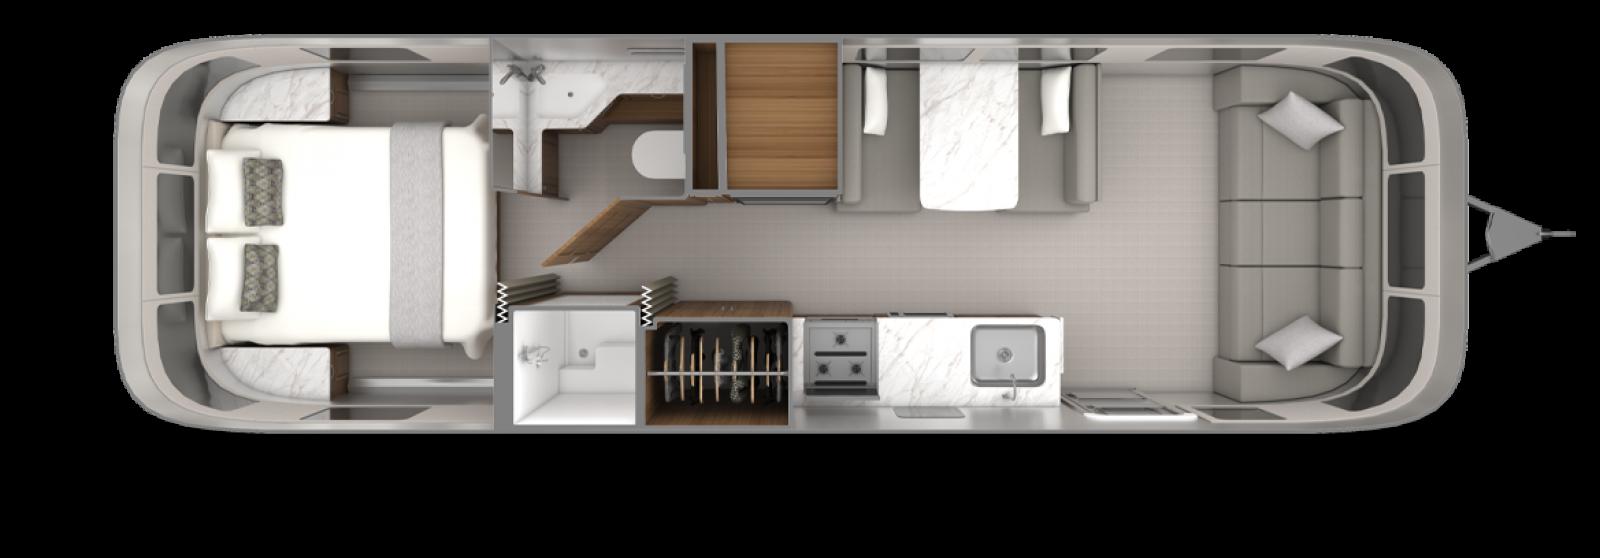 2022_Classic30RB_Floorplan_EstateBrown_EarlGrey